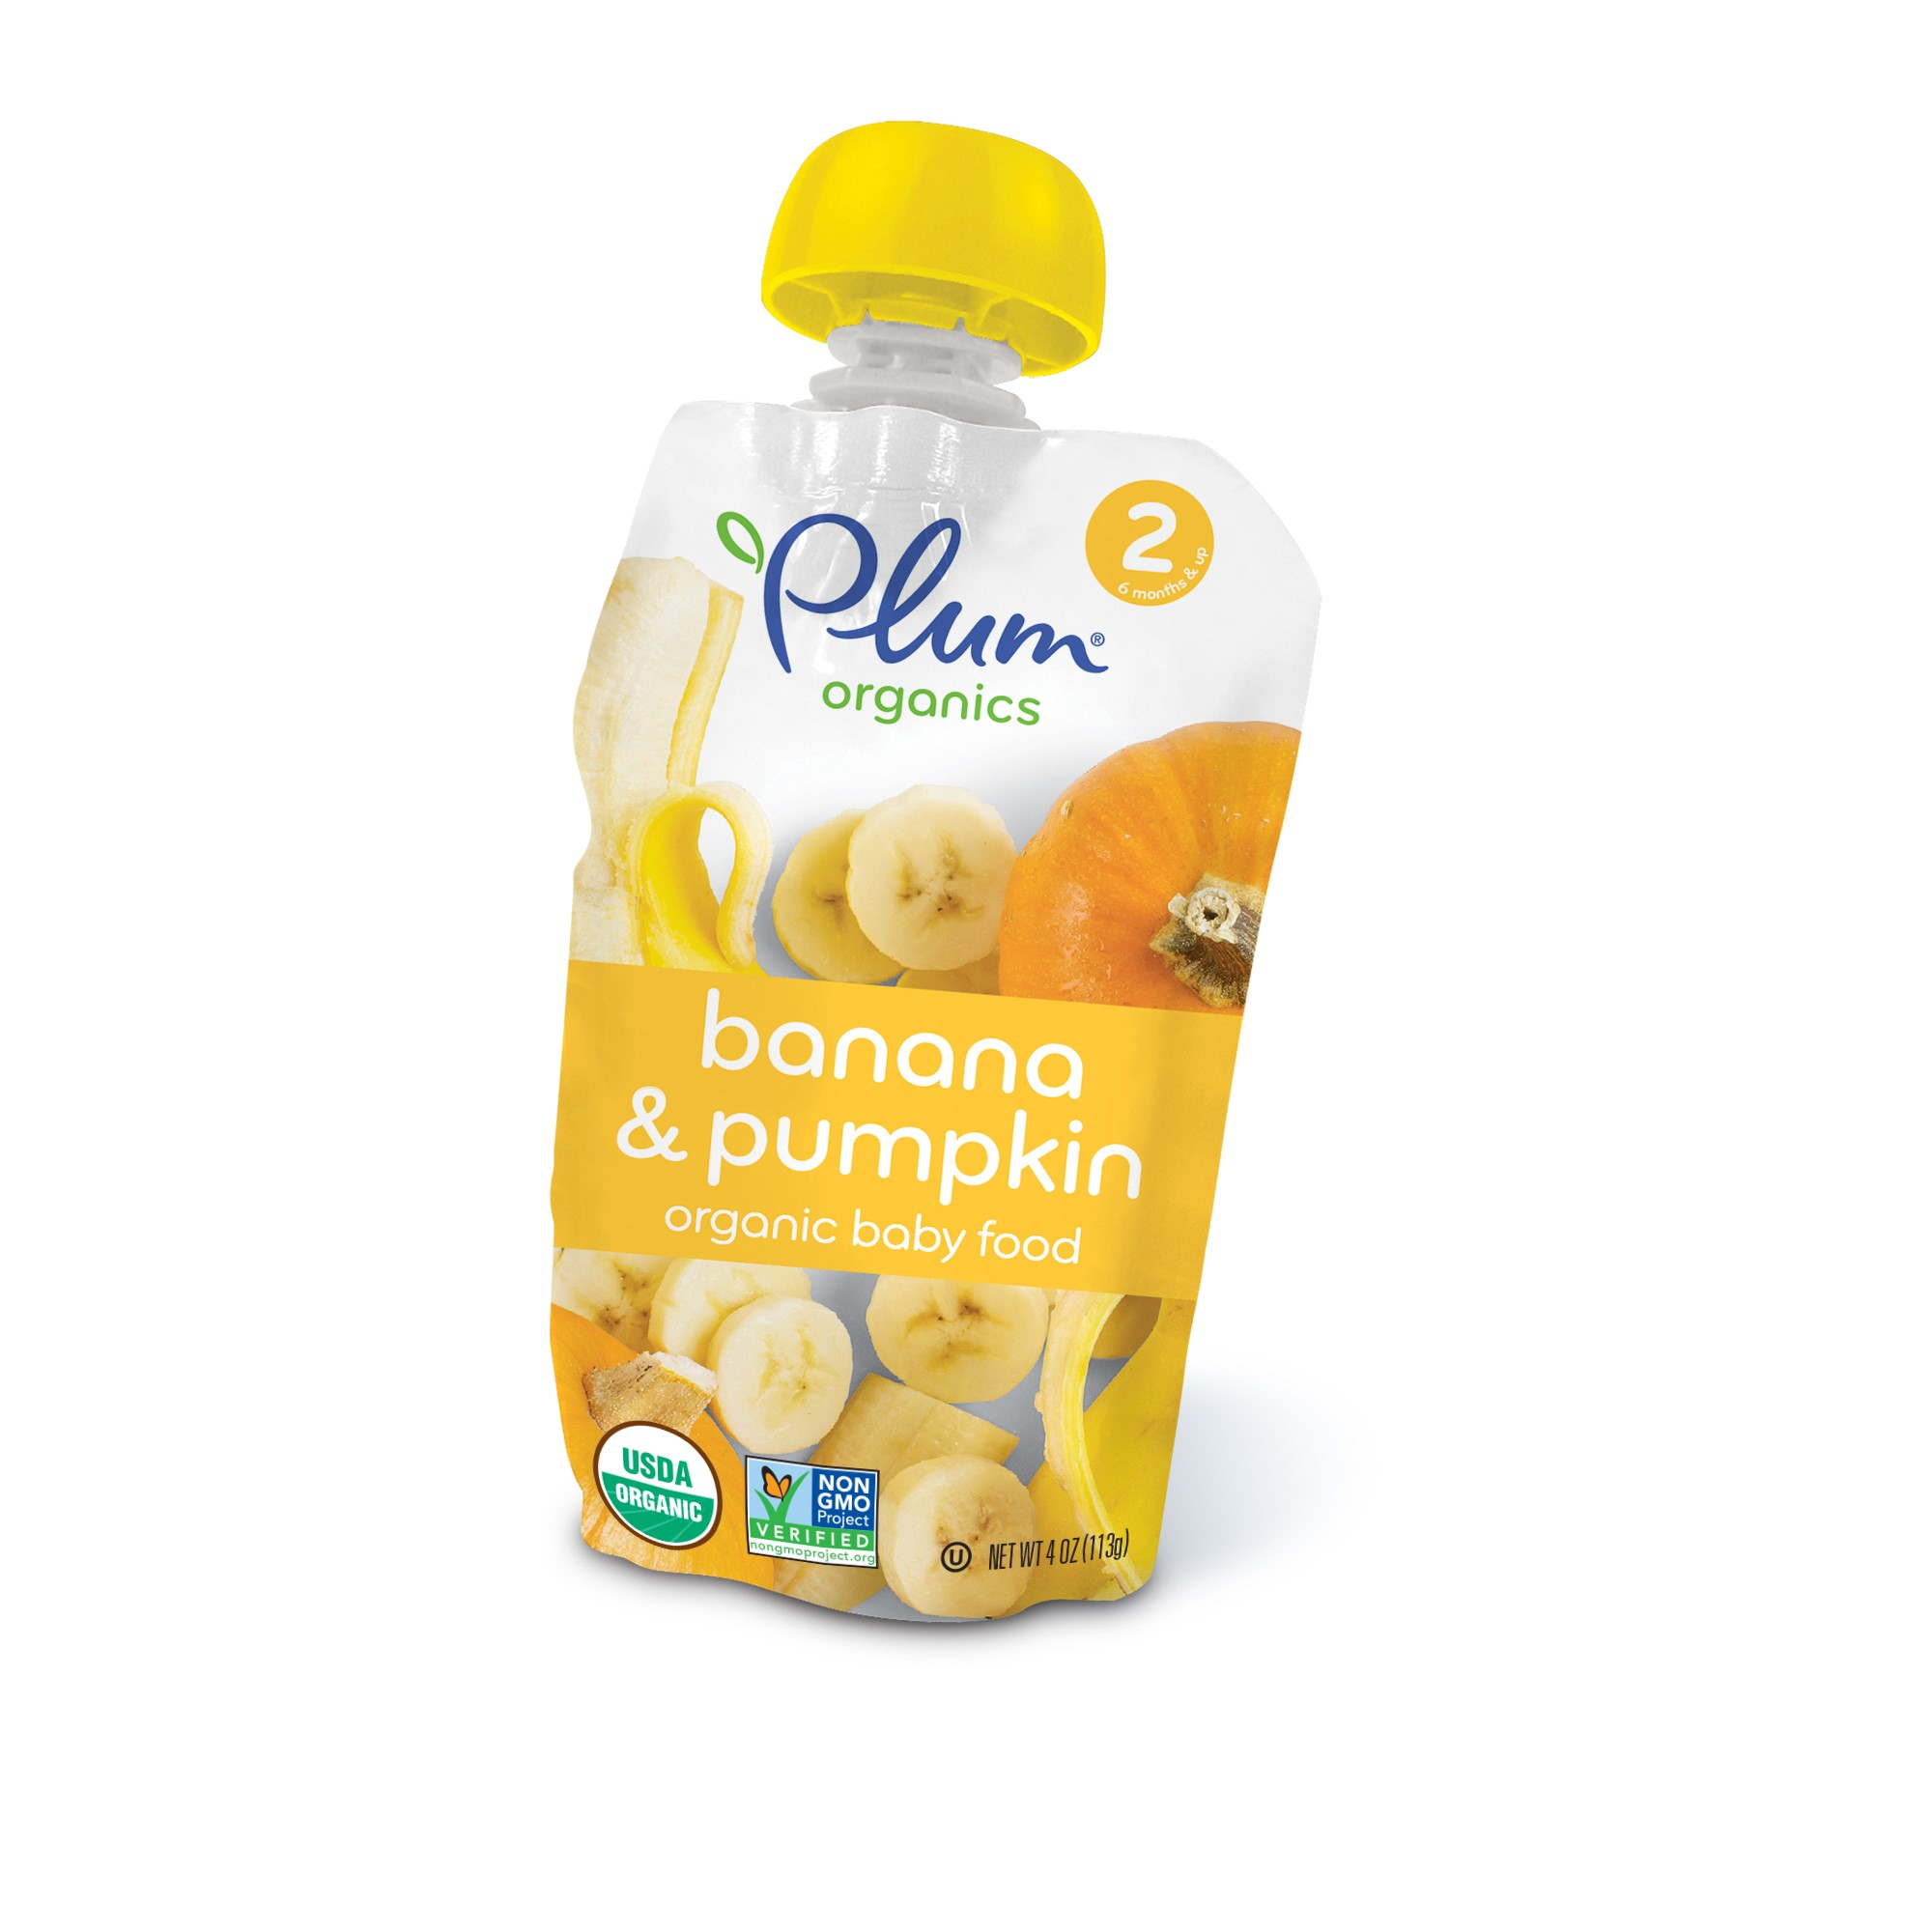 Plum Organics Organic Baby Food, Stage 2, Pumpkin & Banana, 4 Oz